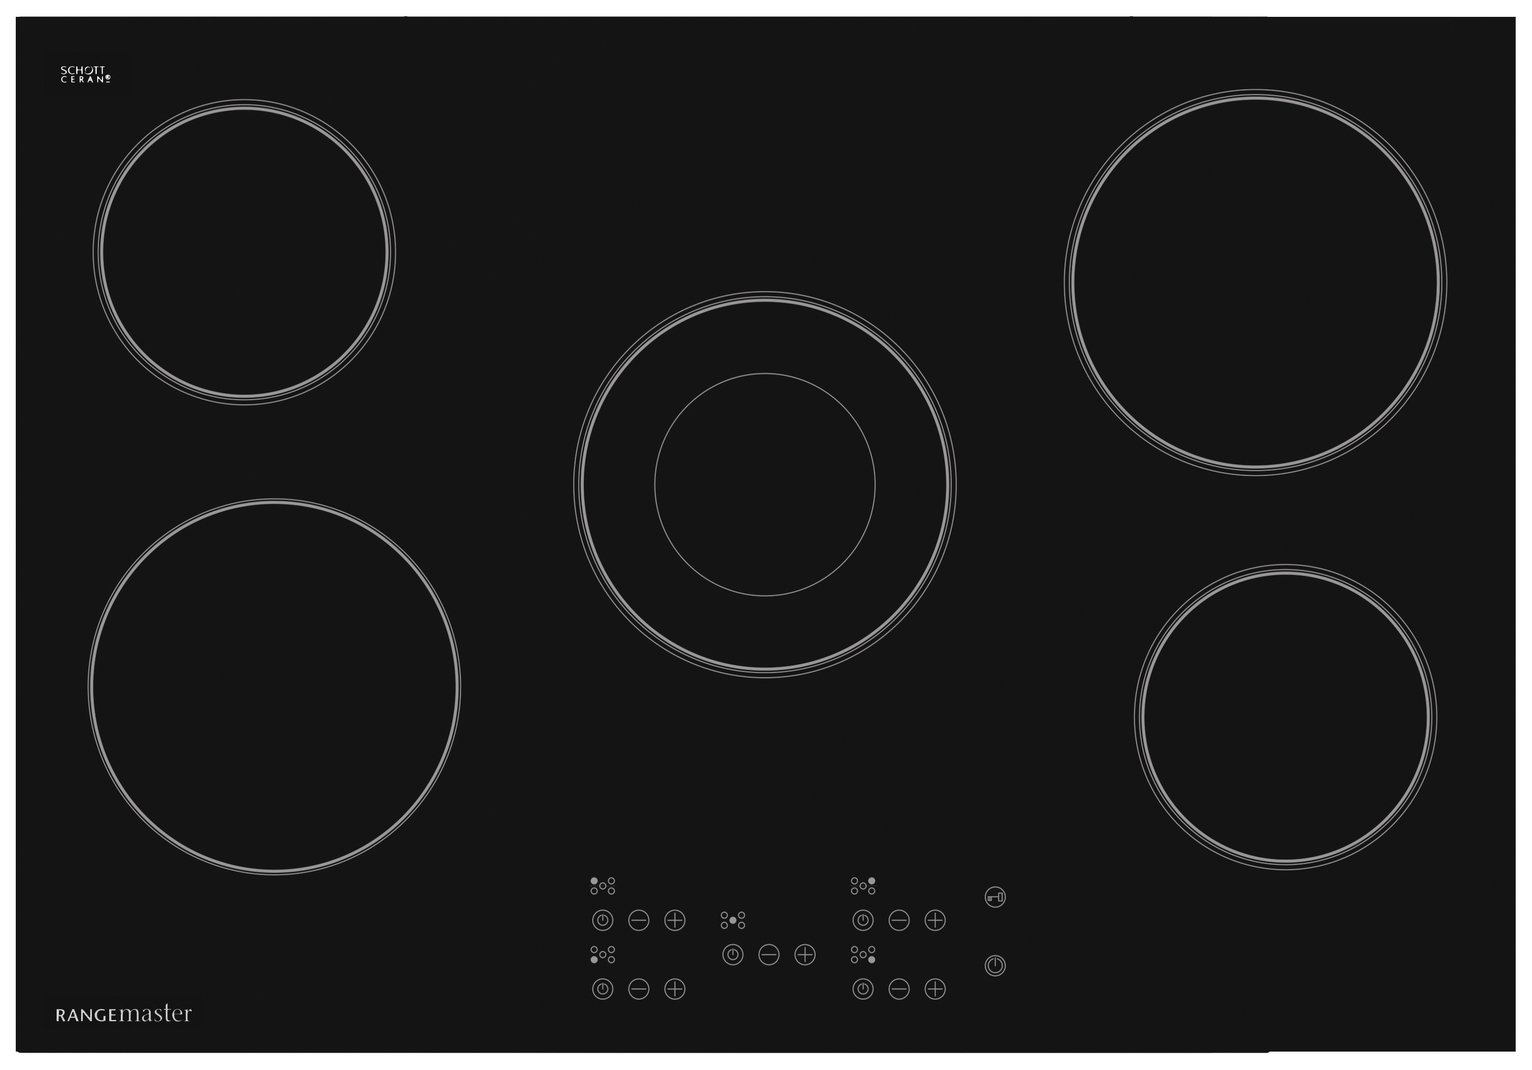 Rangemaster RMB75HPECGL Electric Ceramic Hob - Black